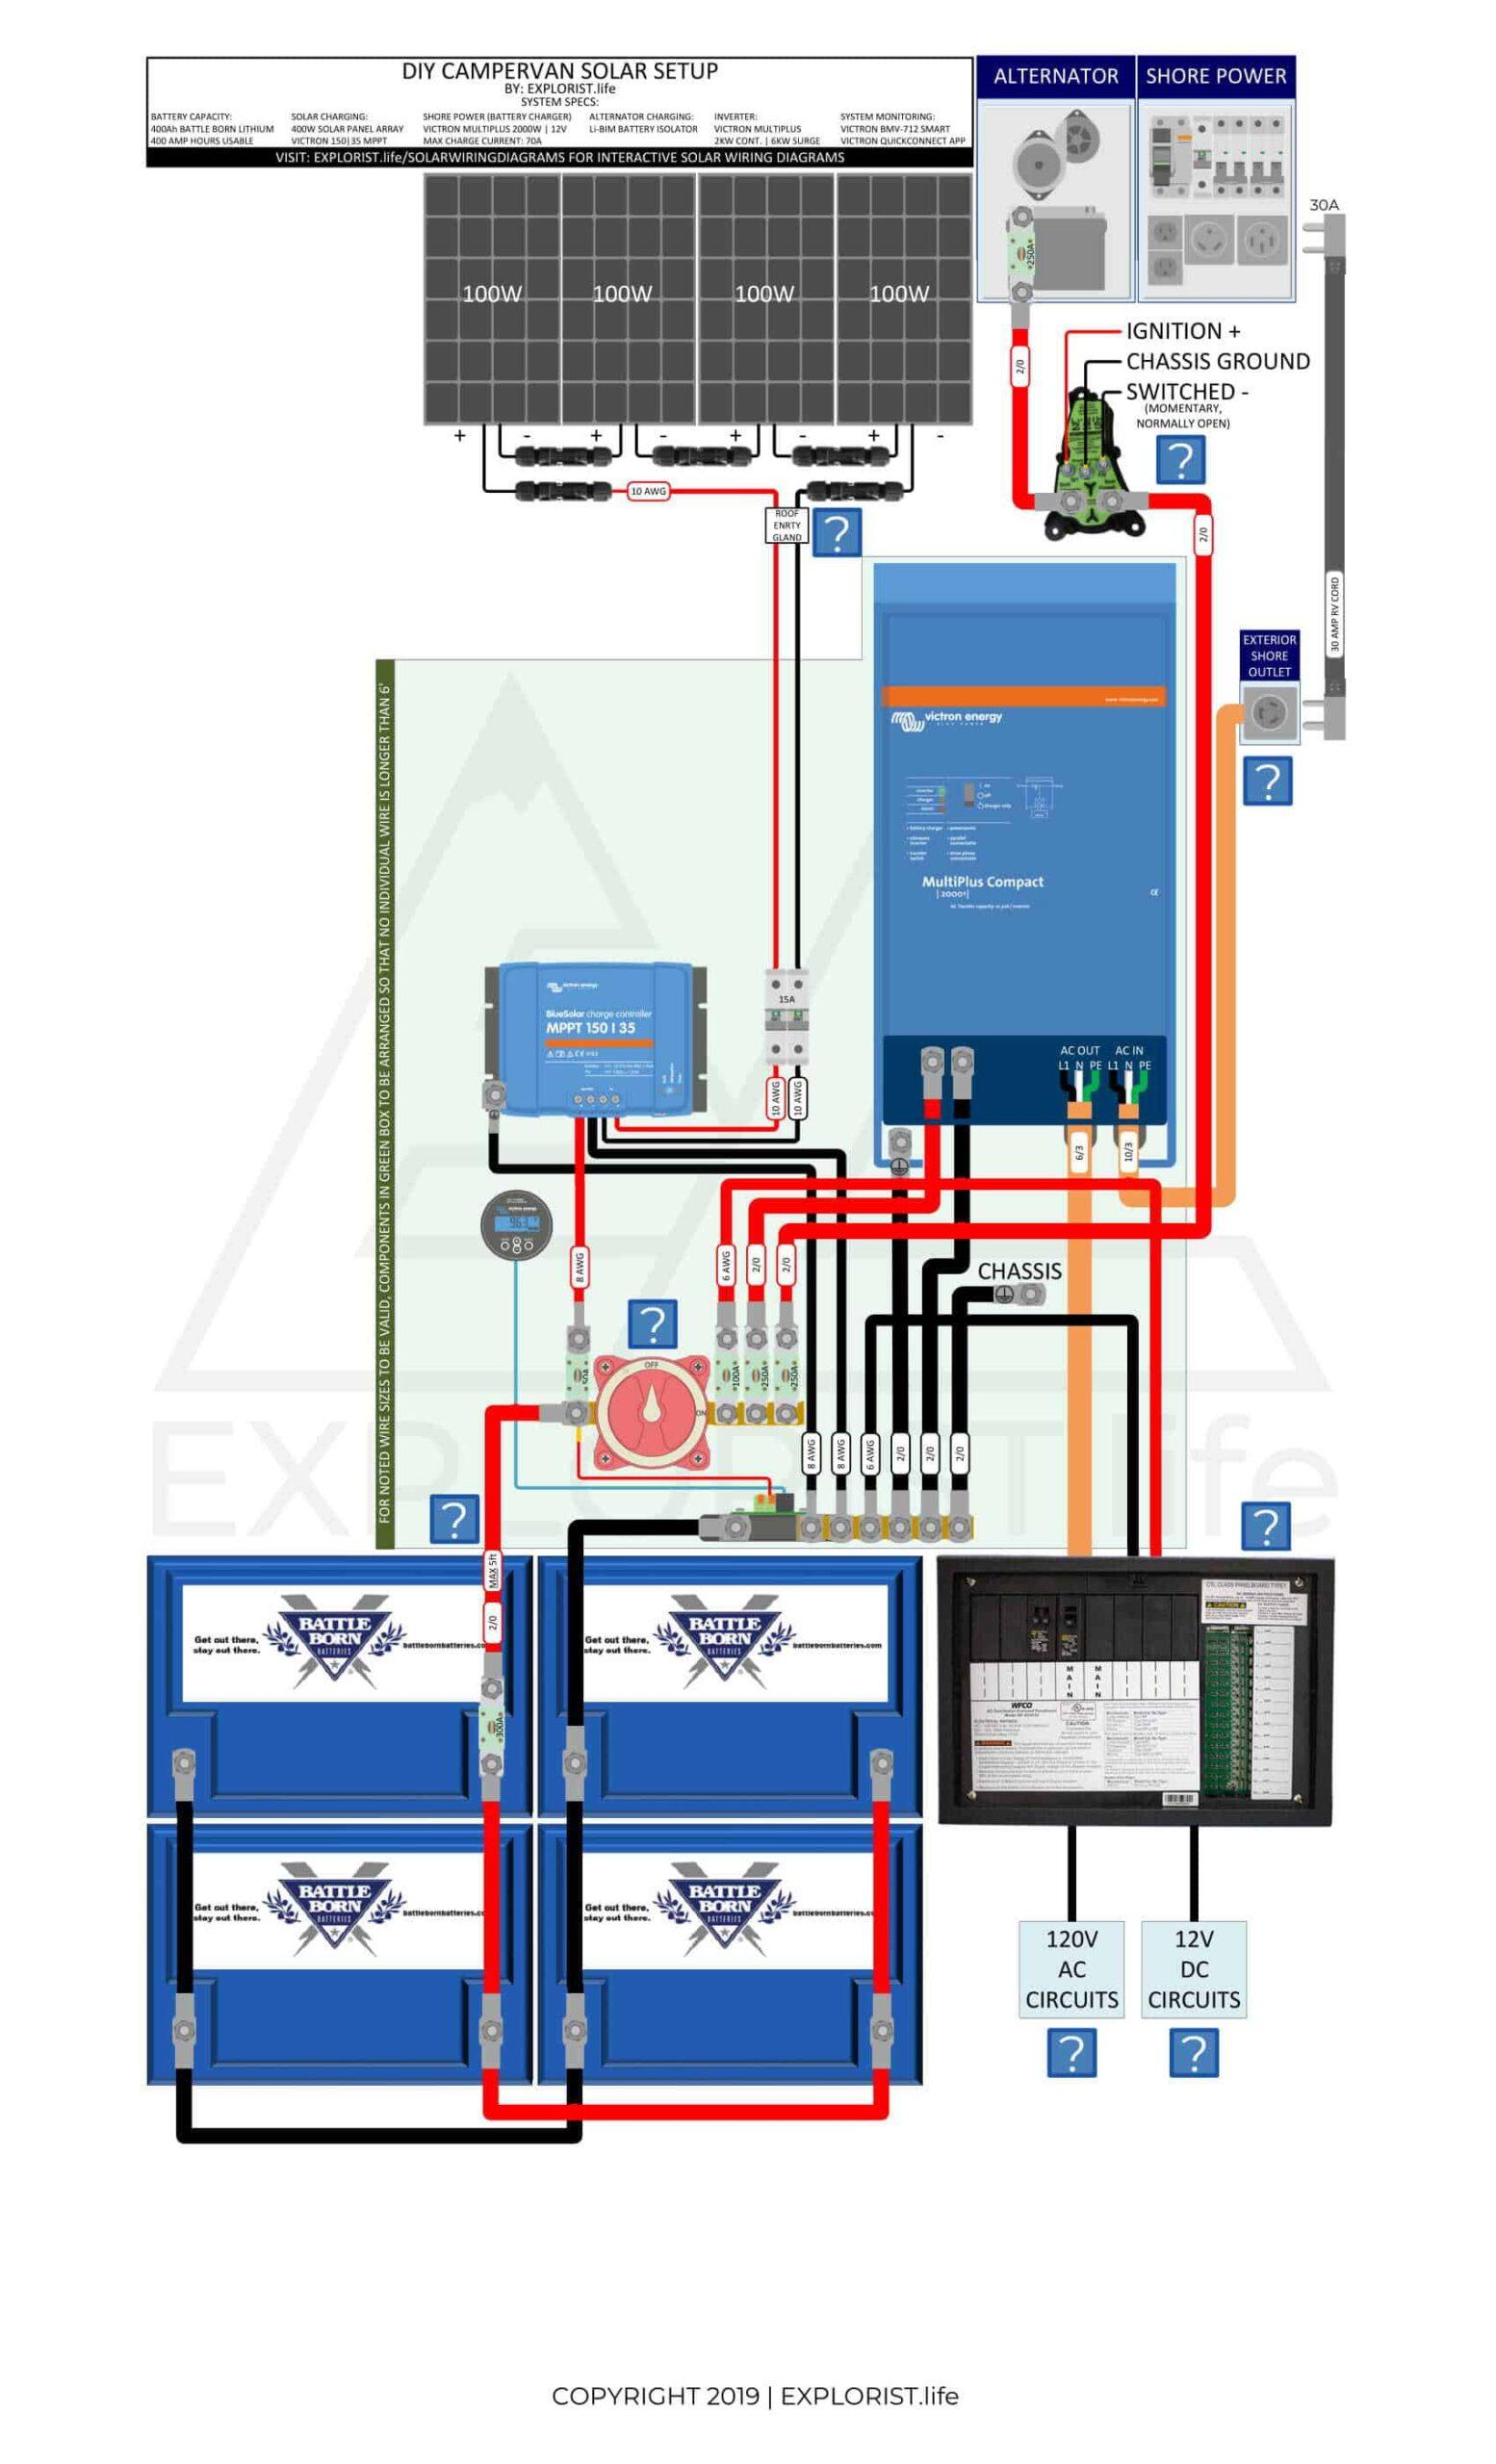 400Ah Lithium Battery Bank – 4x100W Solar – 2kW Inverter/Charger – Li-BIM Alternator Charging